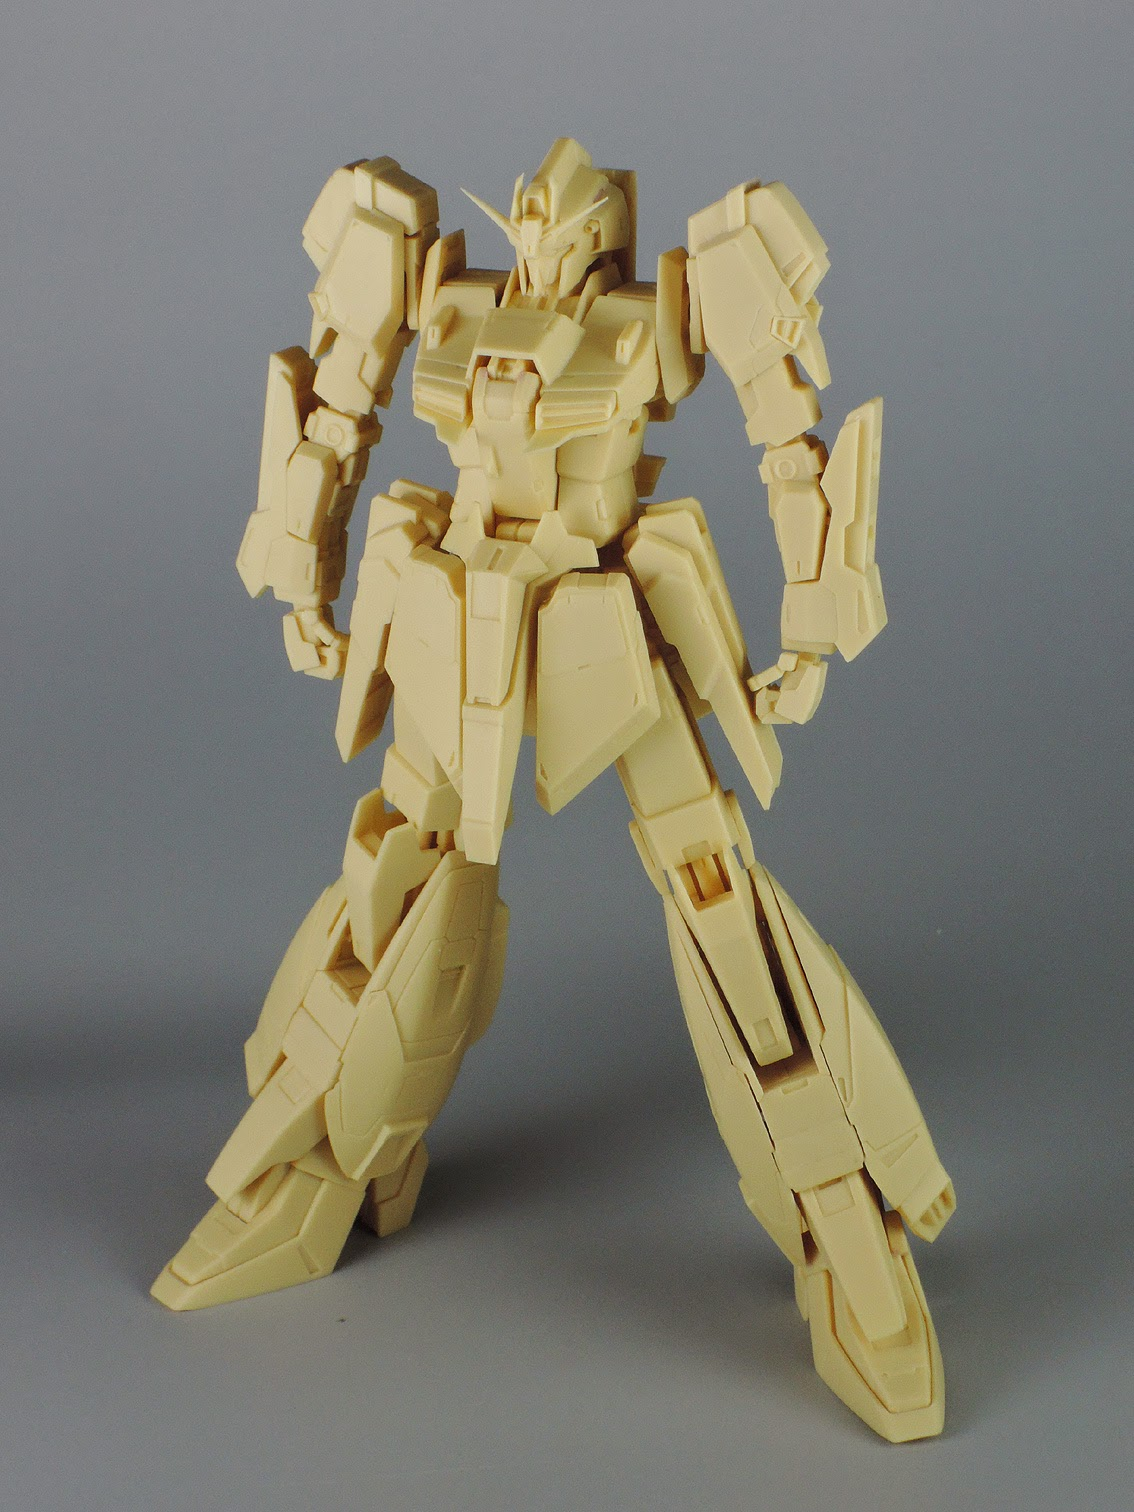 D-Place 1/144 MSZ-006 Z Gundam Garage Kit C3 x Hobby 2014